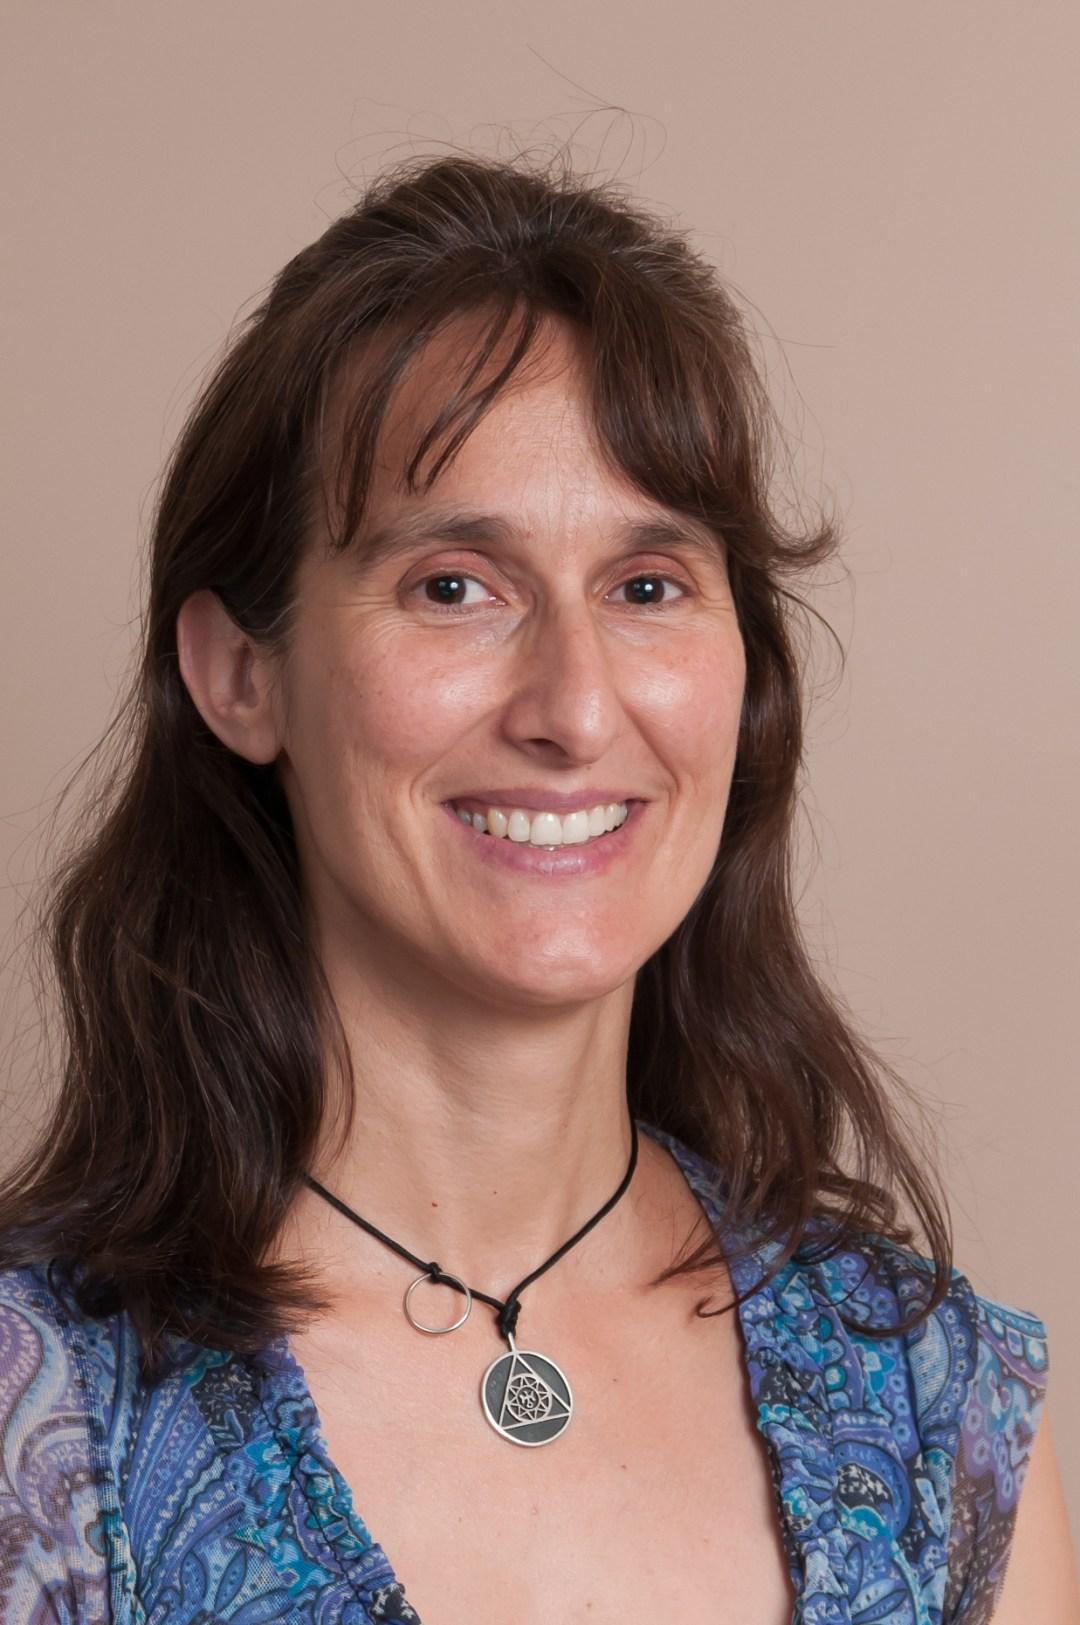 Michelle Ciccaglione, Licensed Massage Therapist at Simsbury Therapeutic Massage & Wellness